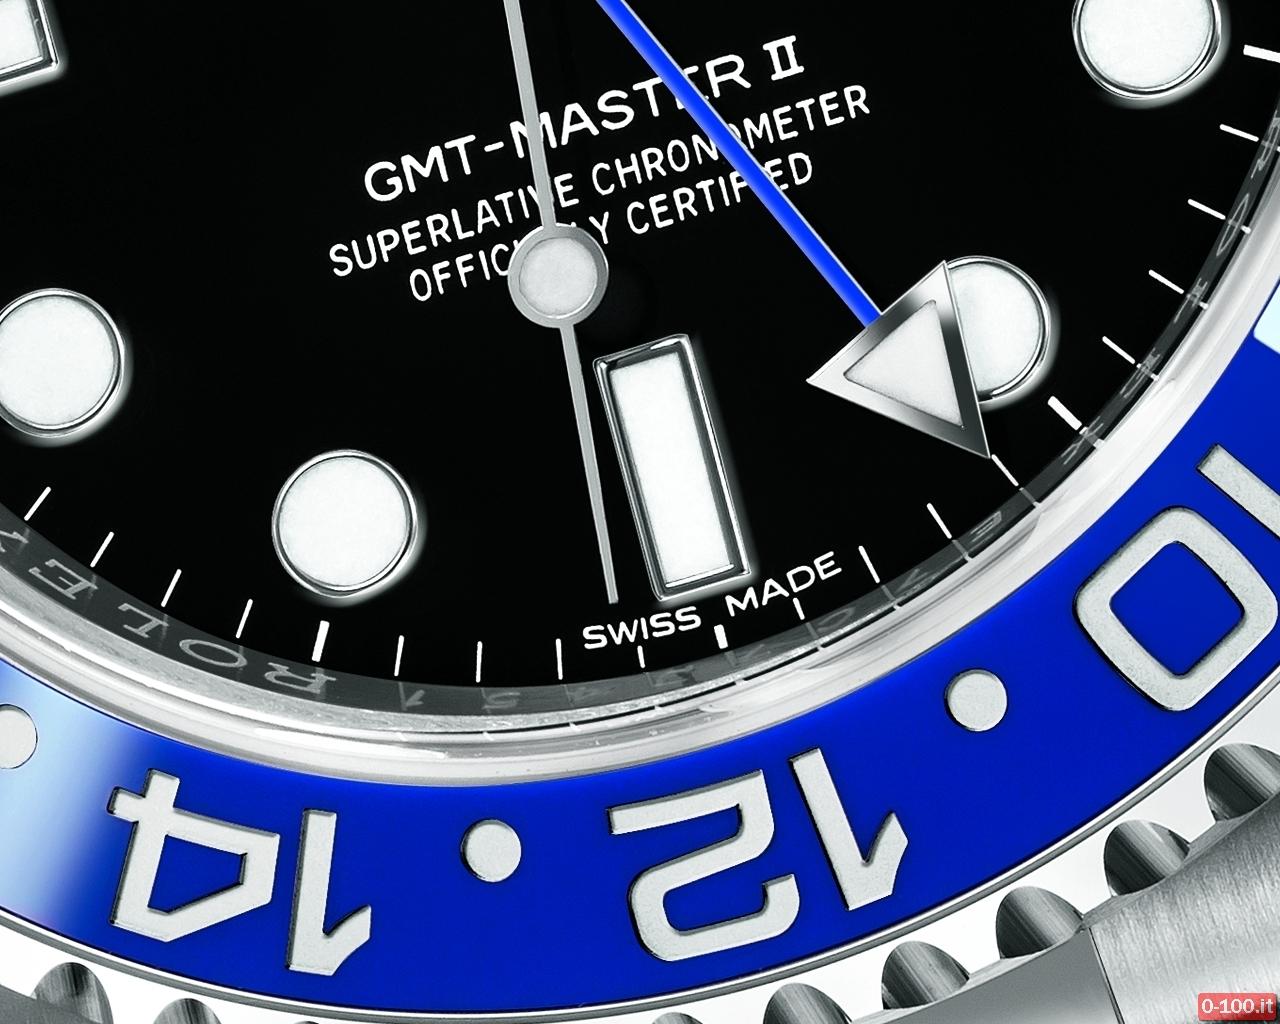 rolex_gmt_master_II_904L_2013 _0-100_9